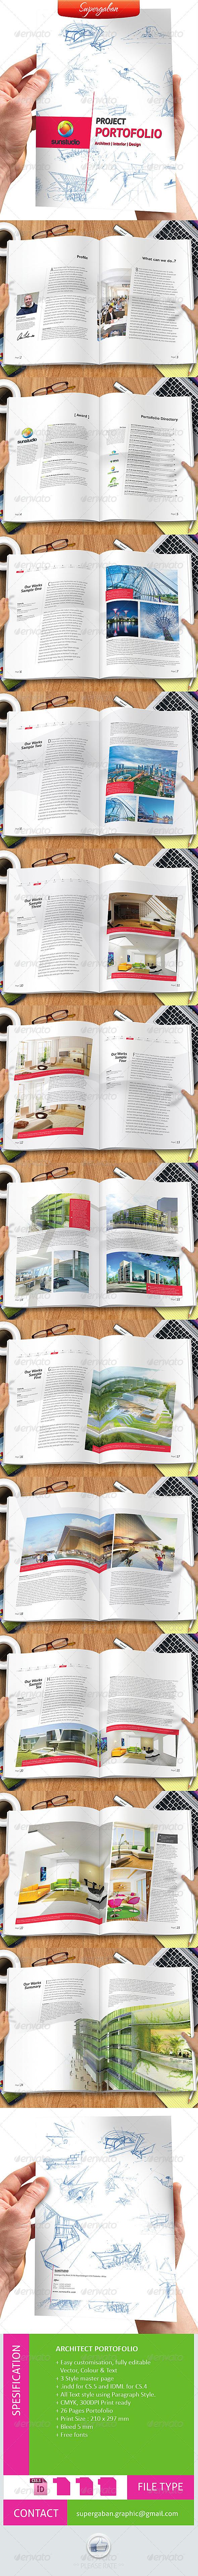 GraphicRiver Architect Portfolio 7238540